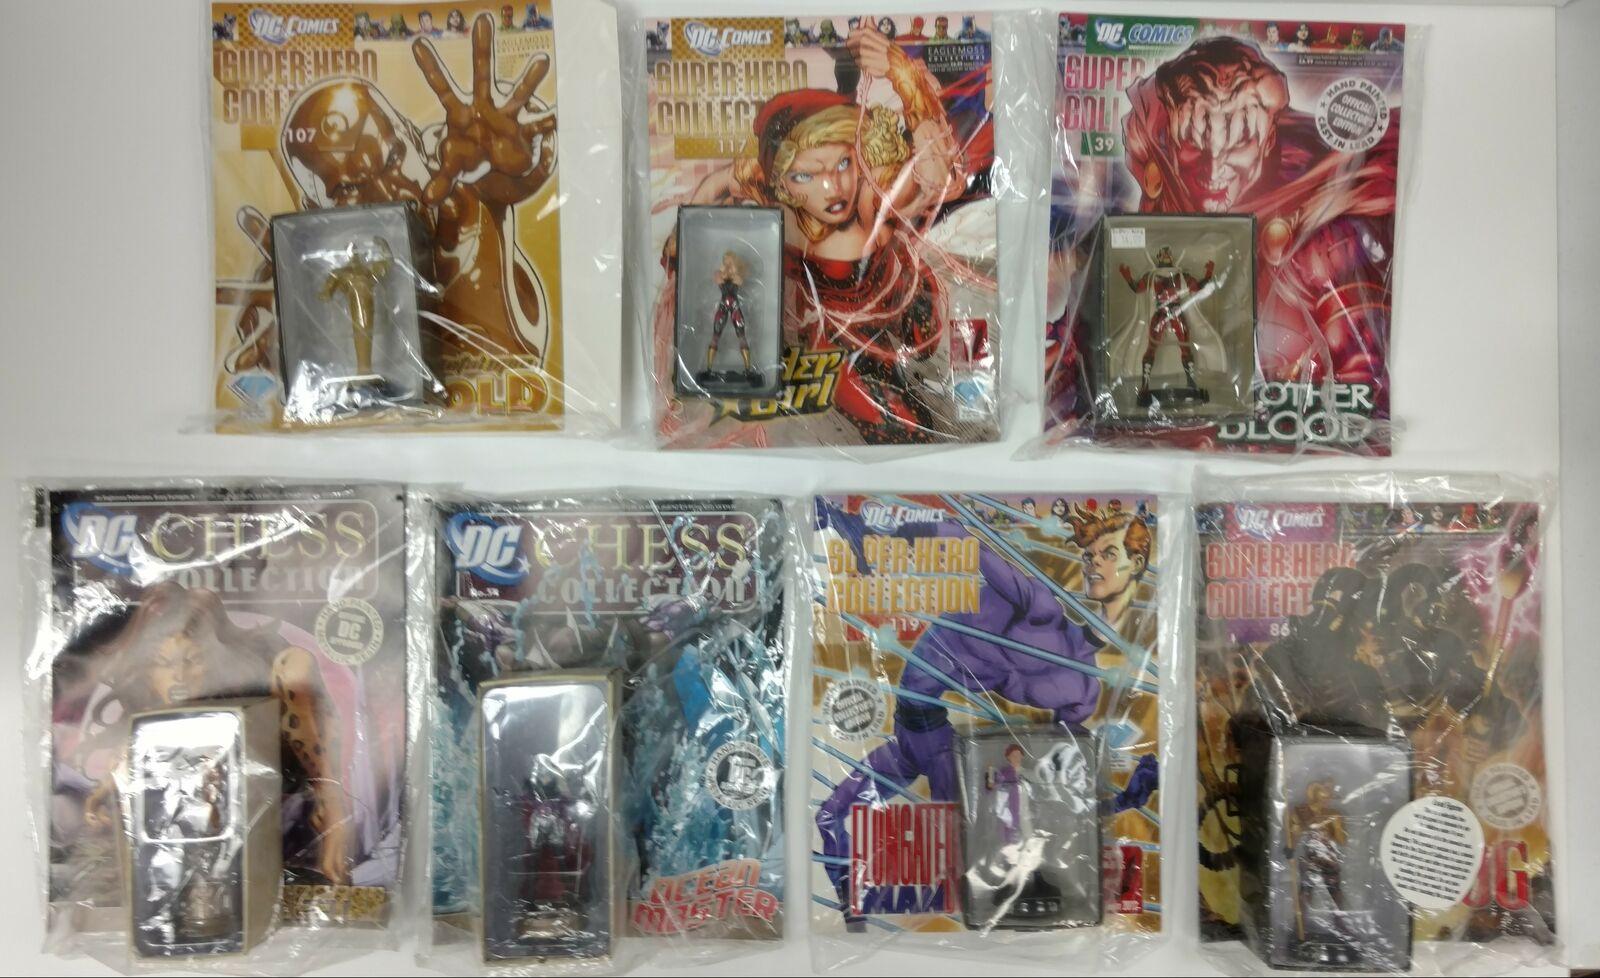 DC Chess e Super Hero  Collection Eaglemoss Lot 7 cifras Plus Magazines  consegna gratuita